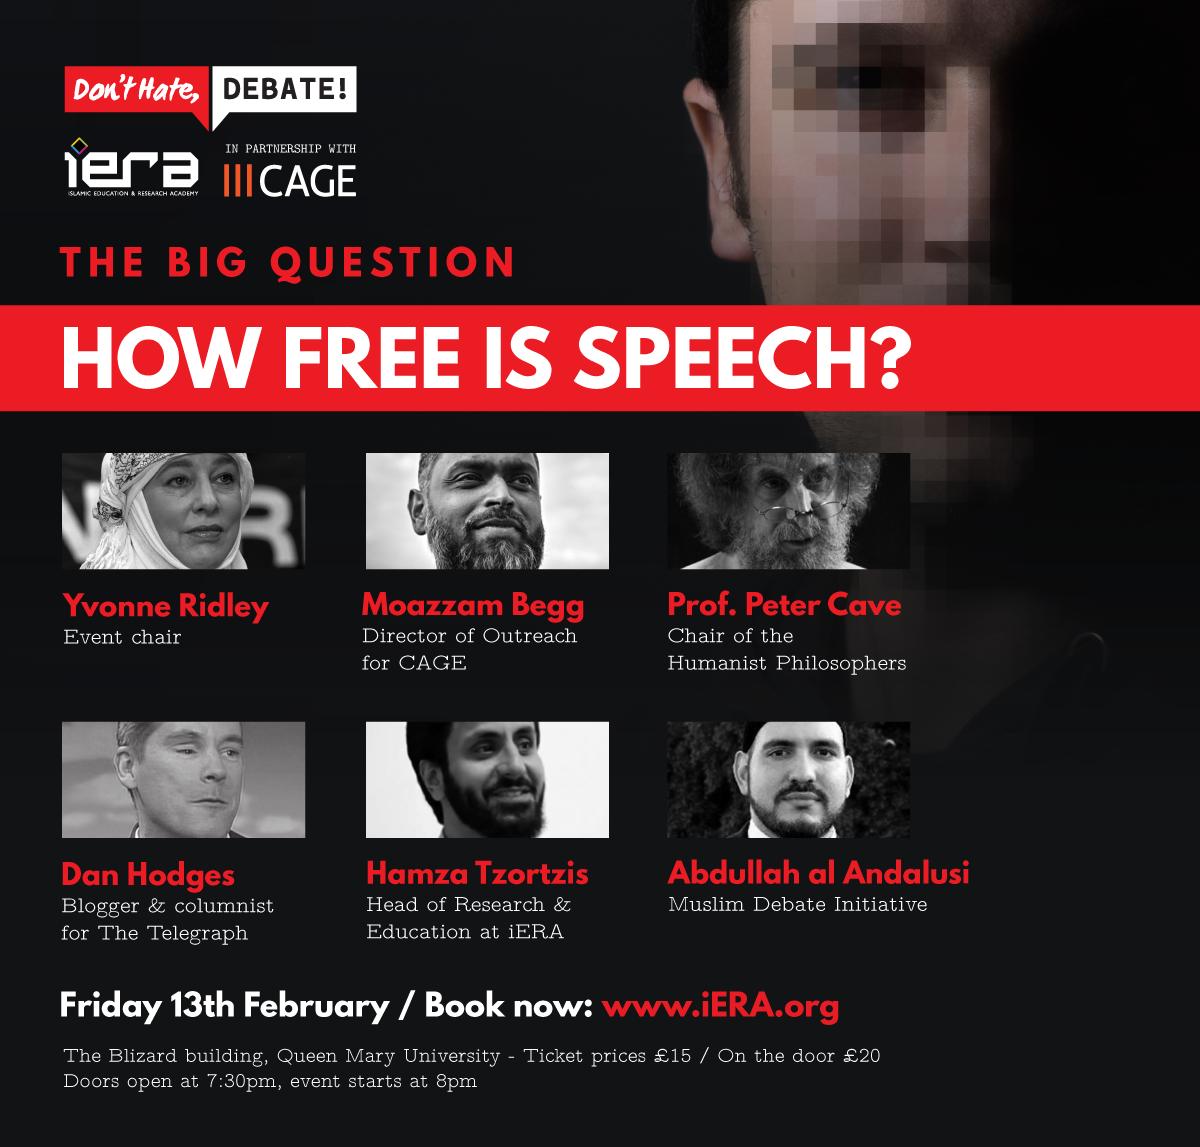 EVENT How Free Is Speech? http://t.co/fUwnM7wtuP @Flossopher @DPJHodges @YvonneRidley @Moazzam_Begg @AbdullaAndalusi http://t.co/zUhHVMMLyP